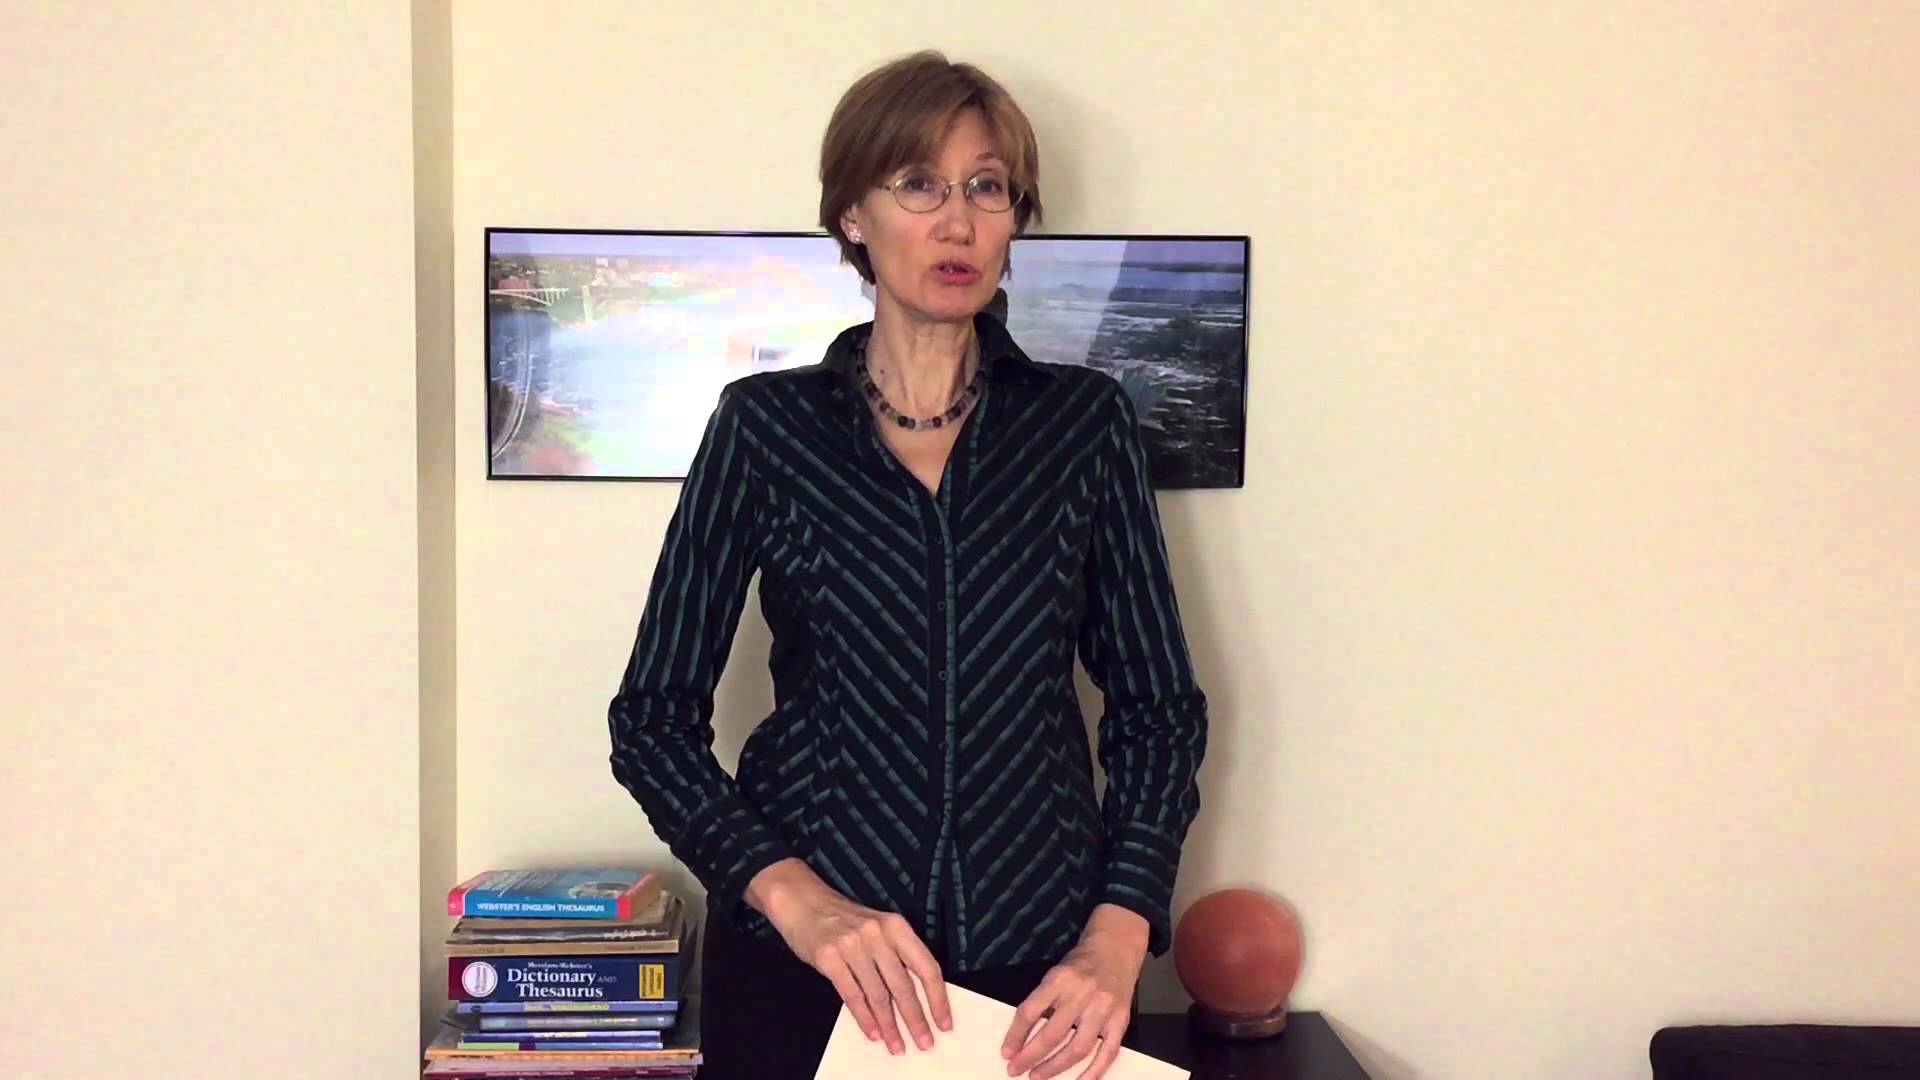 TESOL TEFL Video Testimonial – Iryna